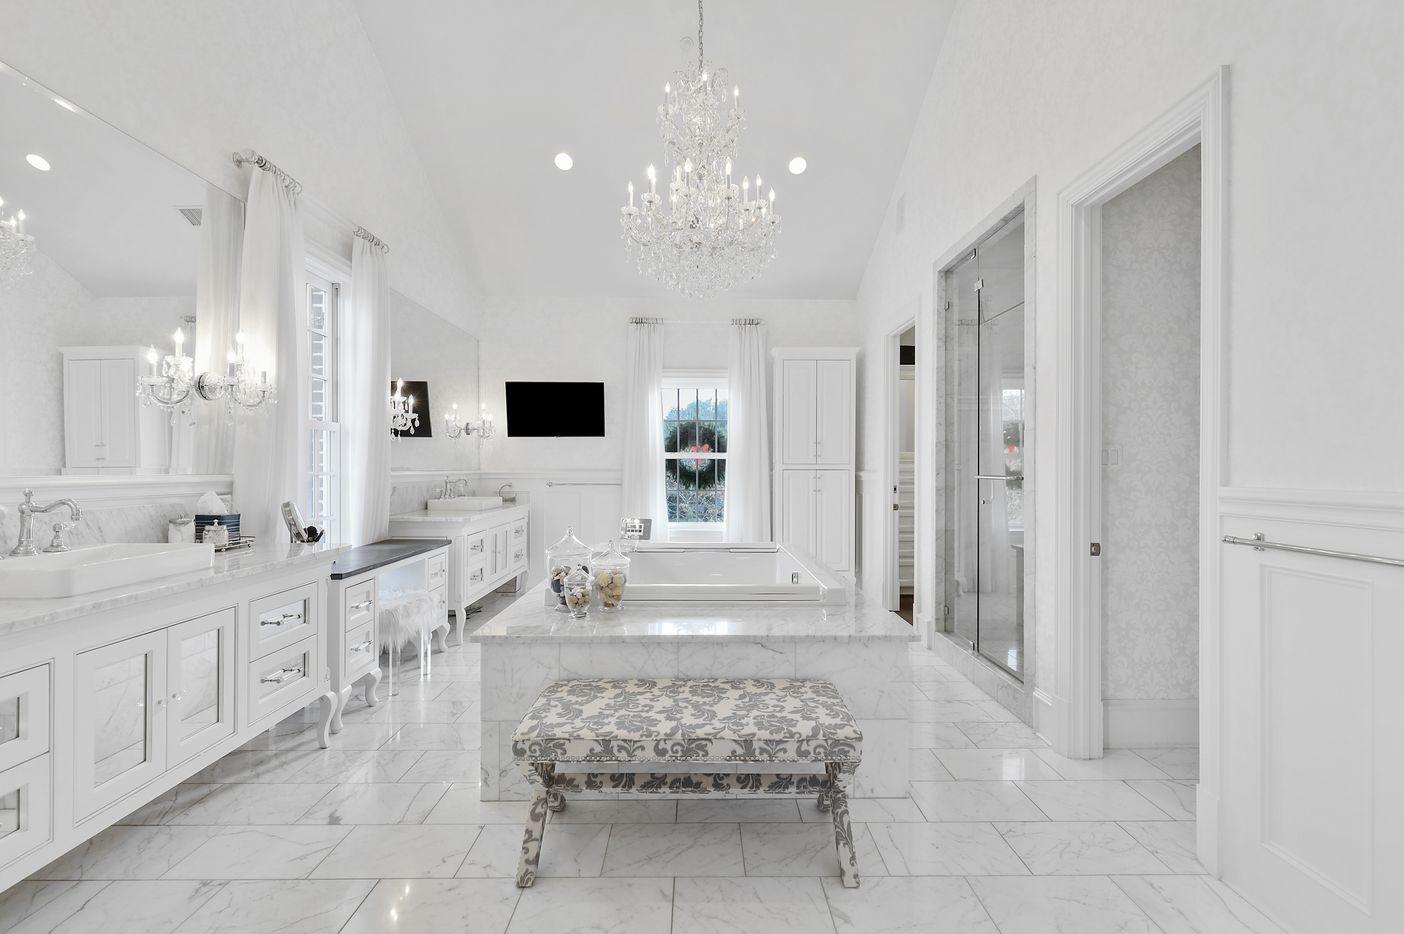 Take a look at the home at 6331 Deloache Ave. in Dallas, TX.